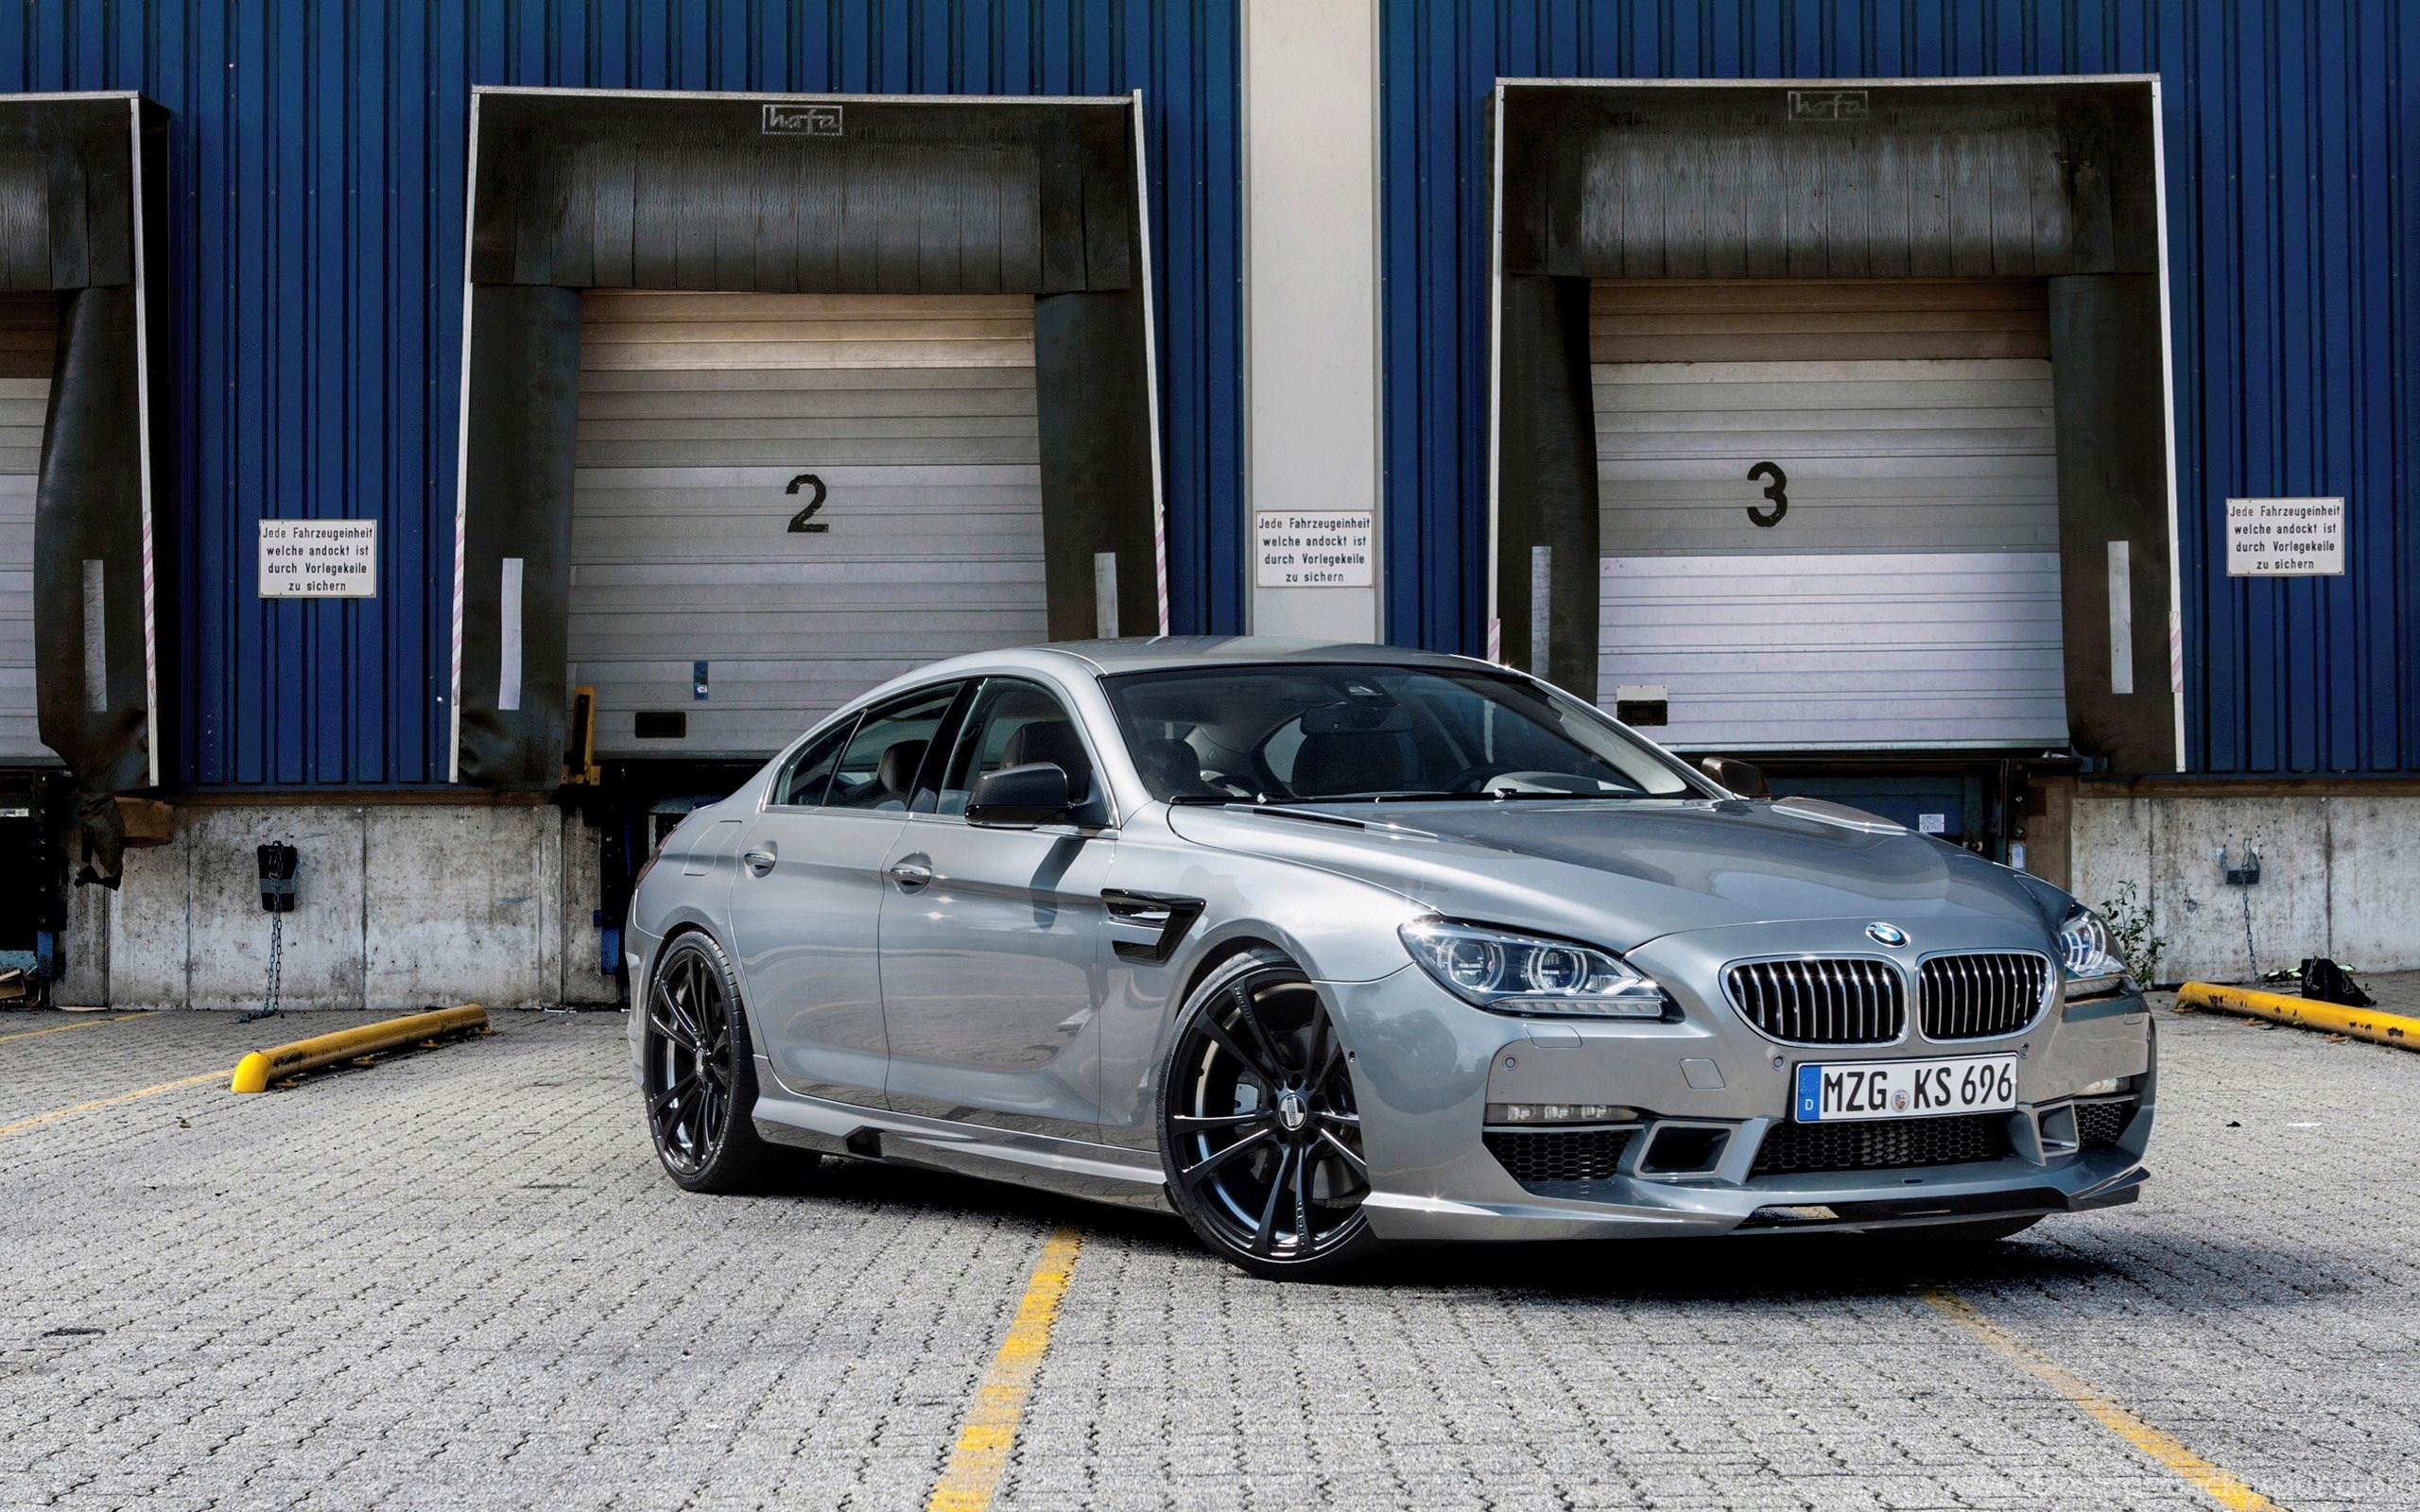 2013 Kelleners Sport BMW 6 Series Gran Coupe Wallpapers Desktop